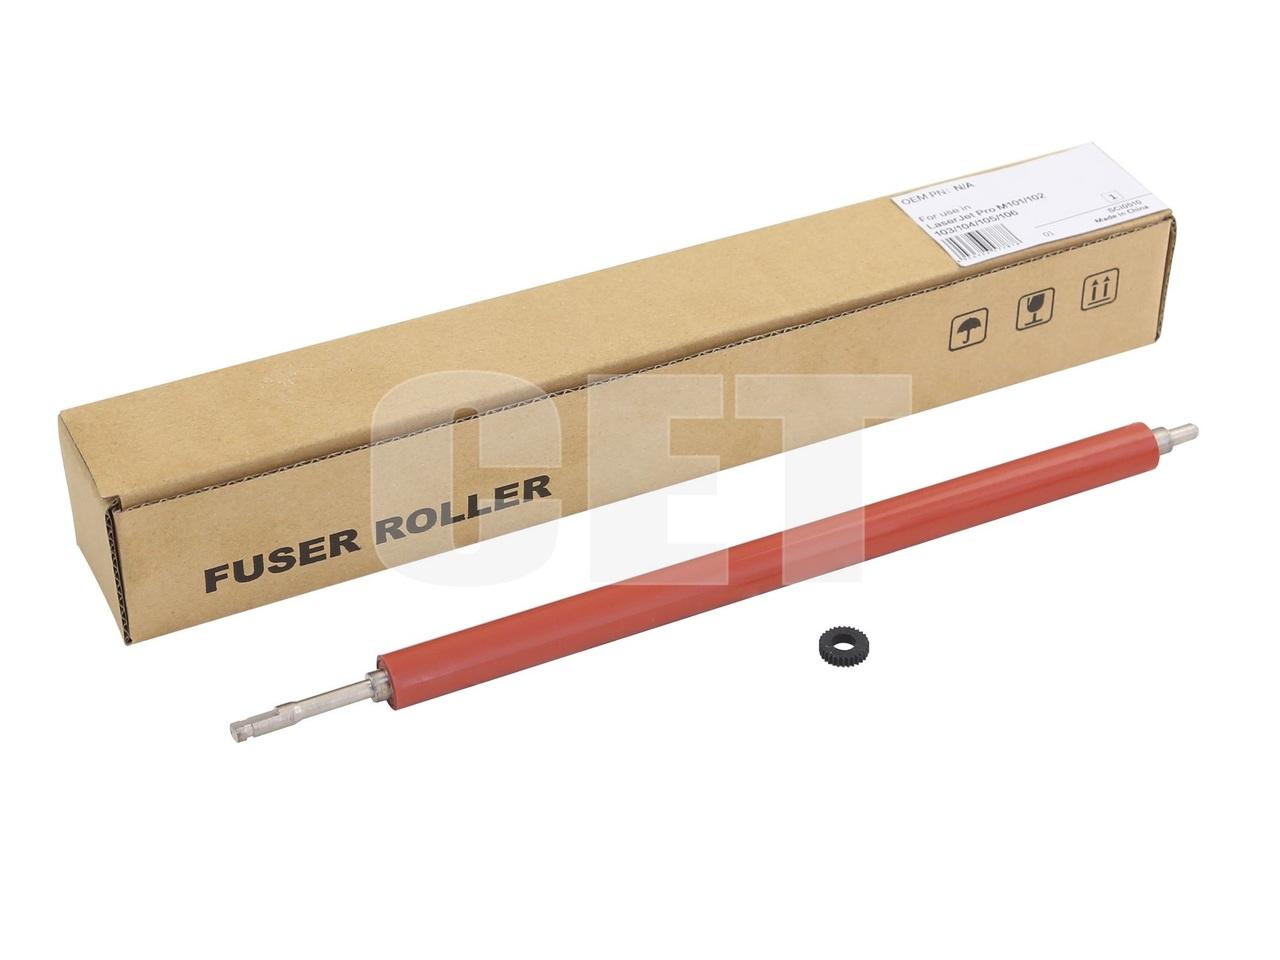 Резиновый вал для HP LaserJet ProM15a/16a/28a/29a/30a/101/102/104/106/131/134 (CET), CET7787